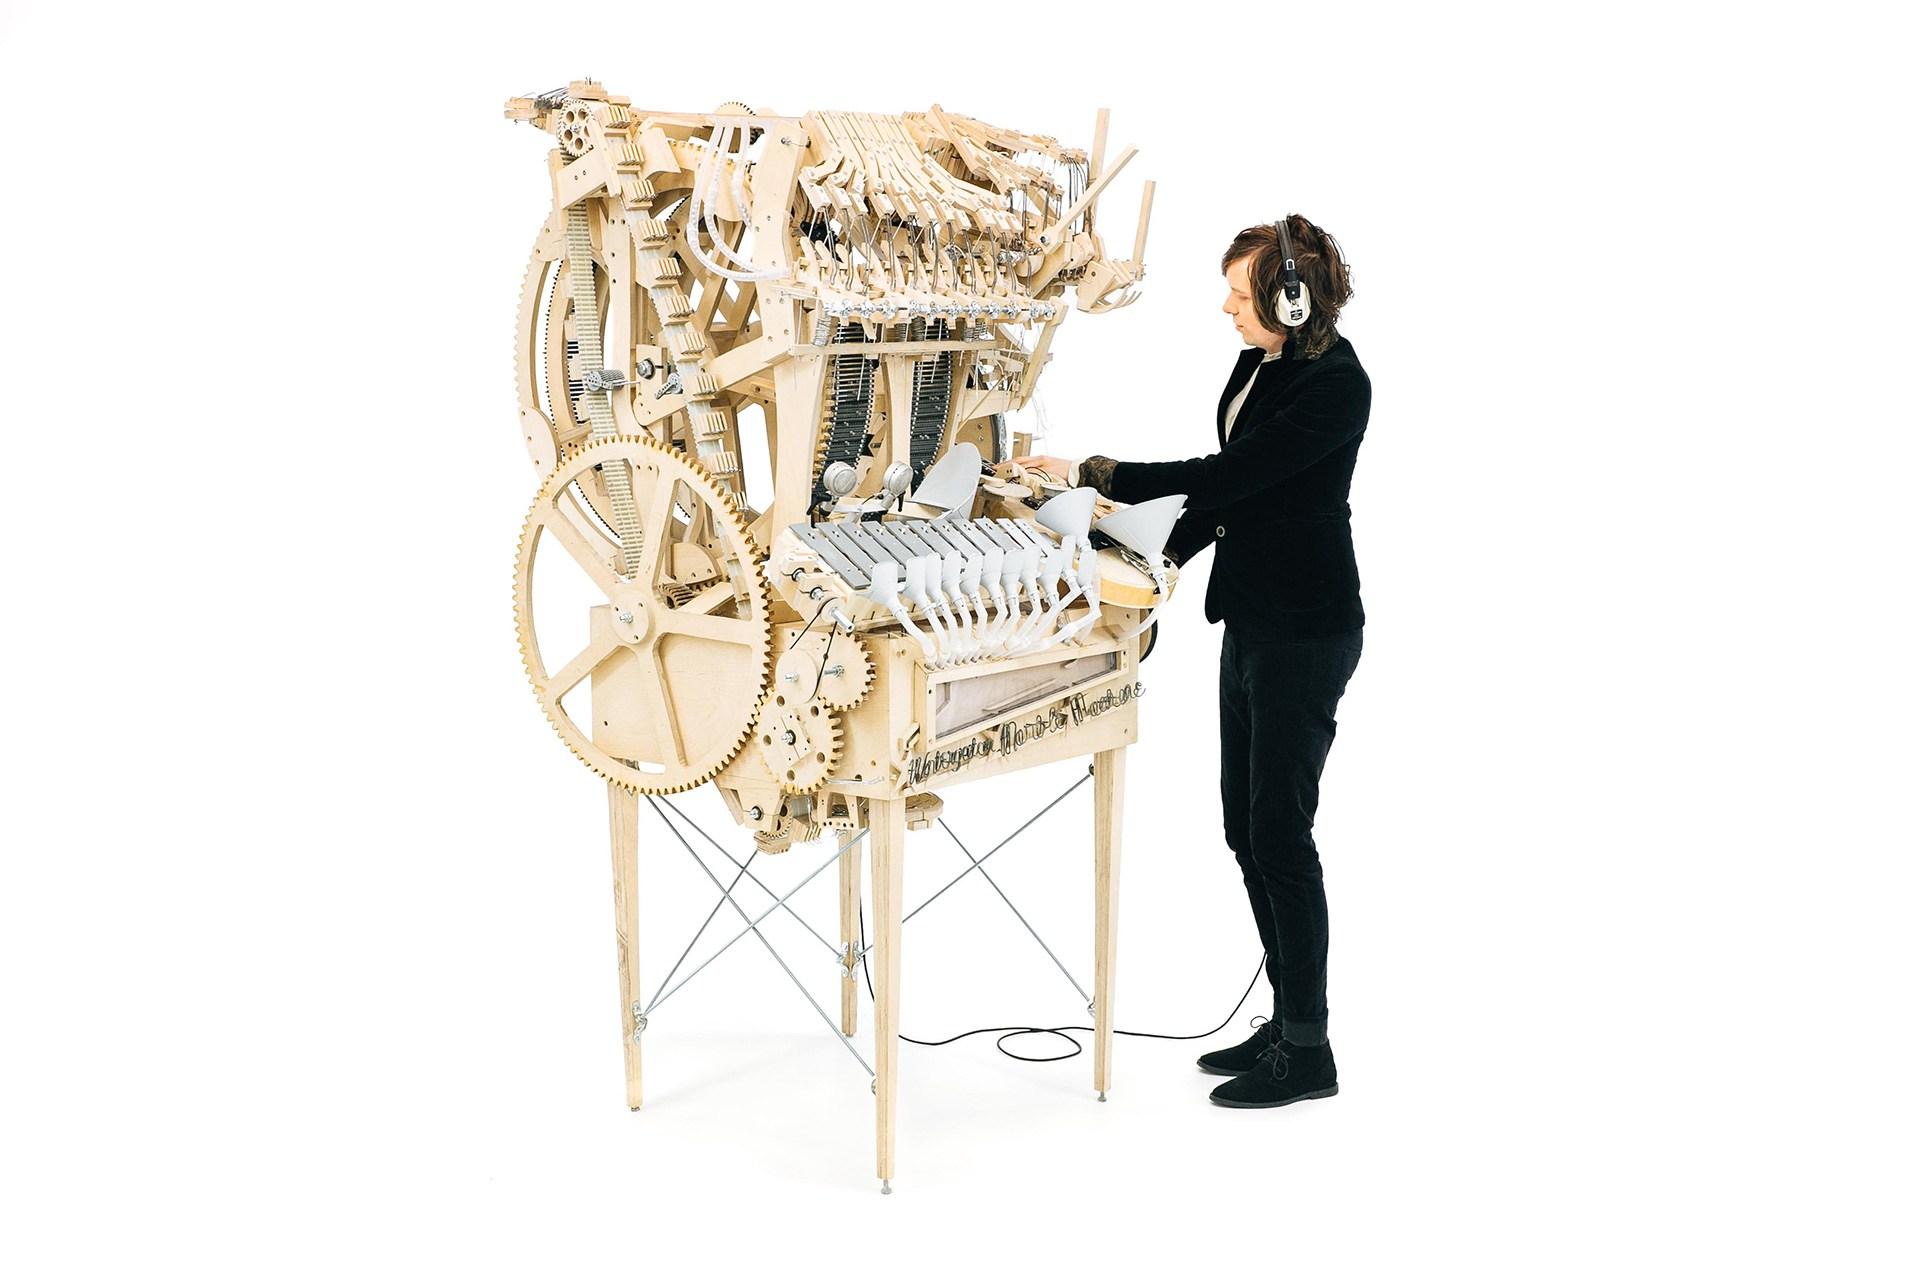 WINTERGATAN_-_Marble_Machine_拨片网_器乐_音乐视频.jpg